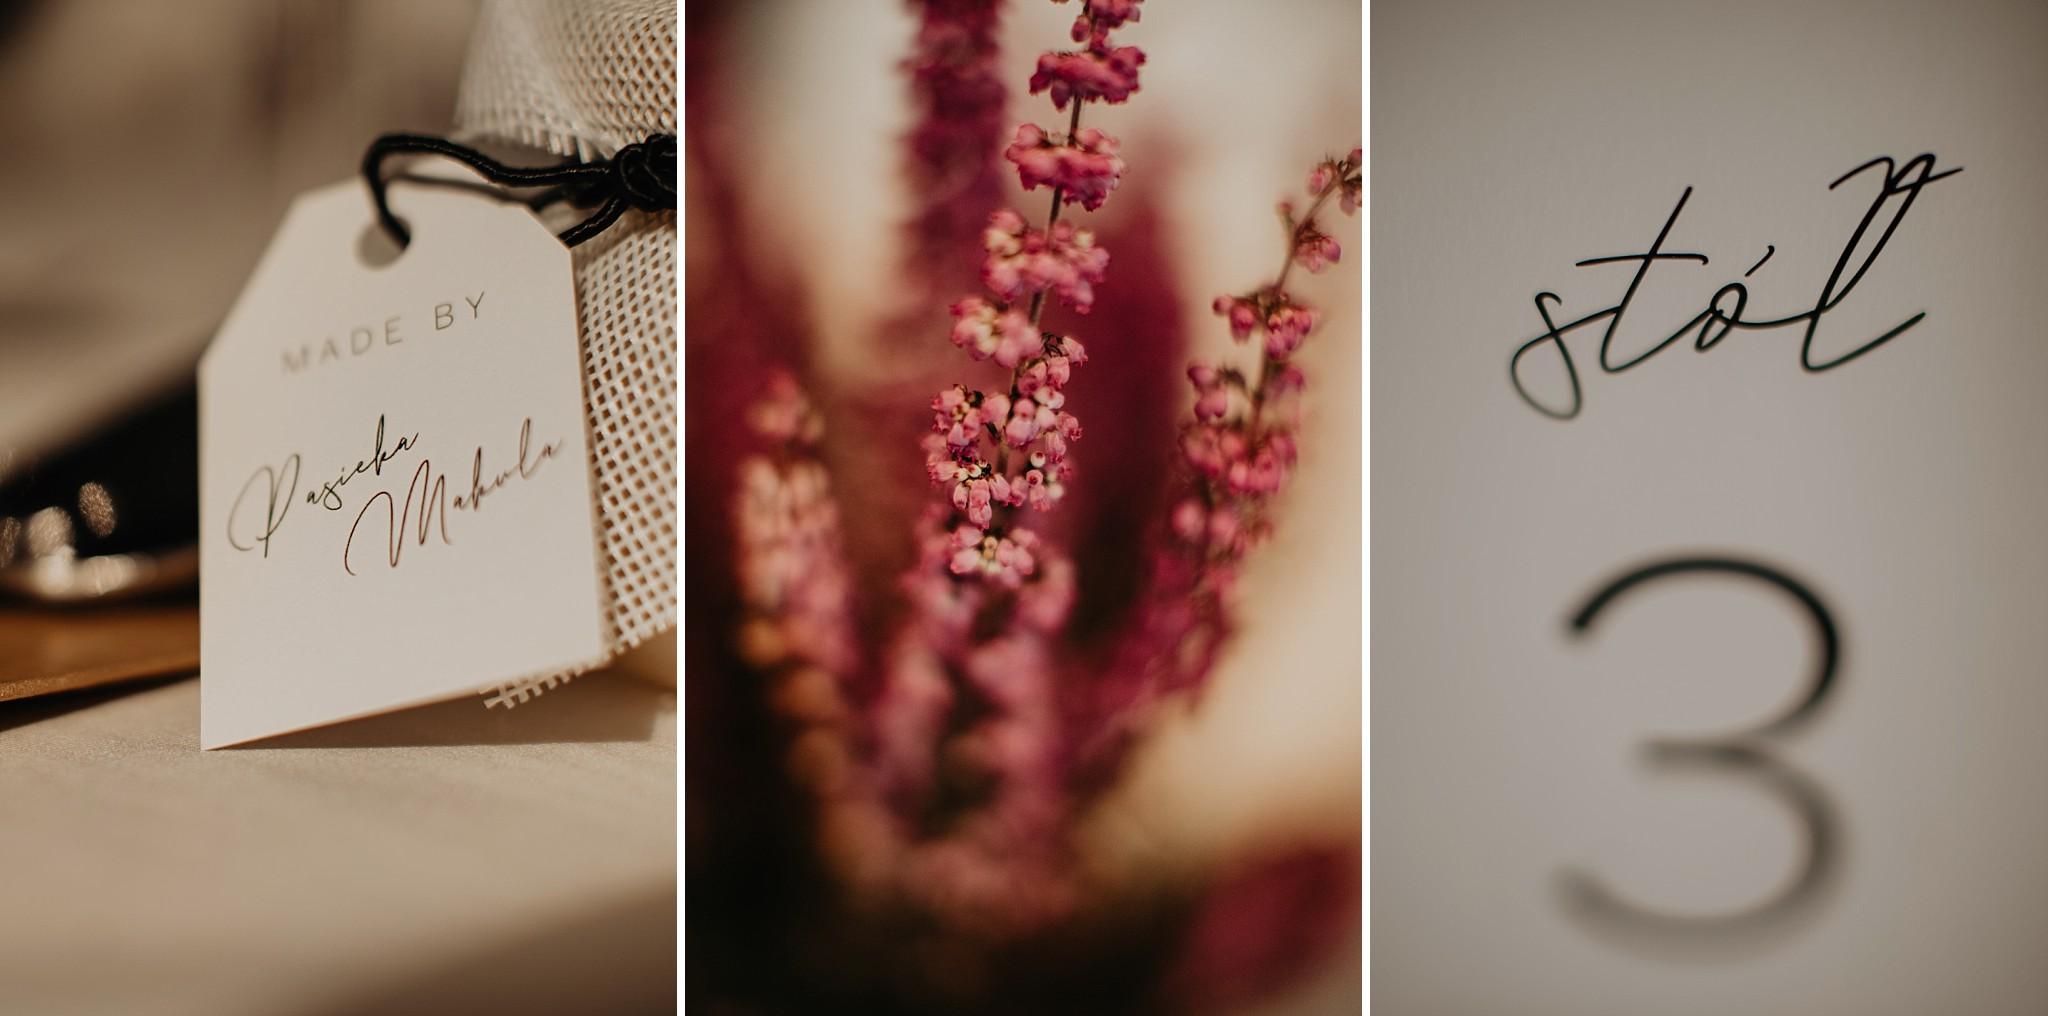 fotograf poznan wesele dobra truskawka piekne wesele pod poznaniem wesele w dobrej truskawce piekna para mloda slub marzen slub koronawirus slub listopad wesele koronawirus 006